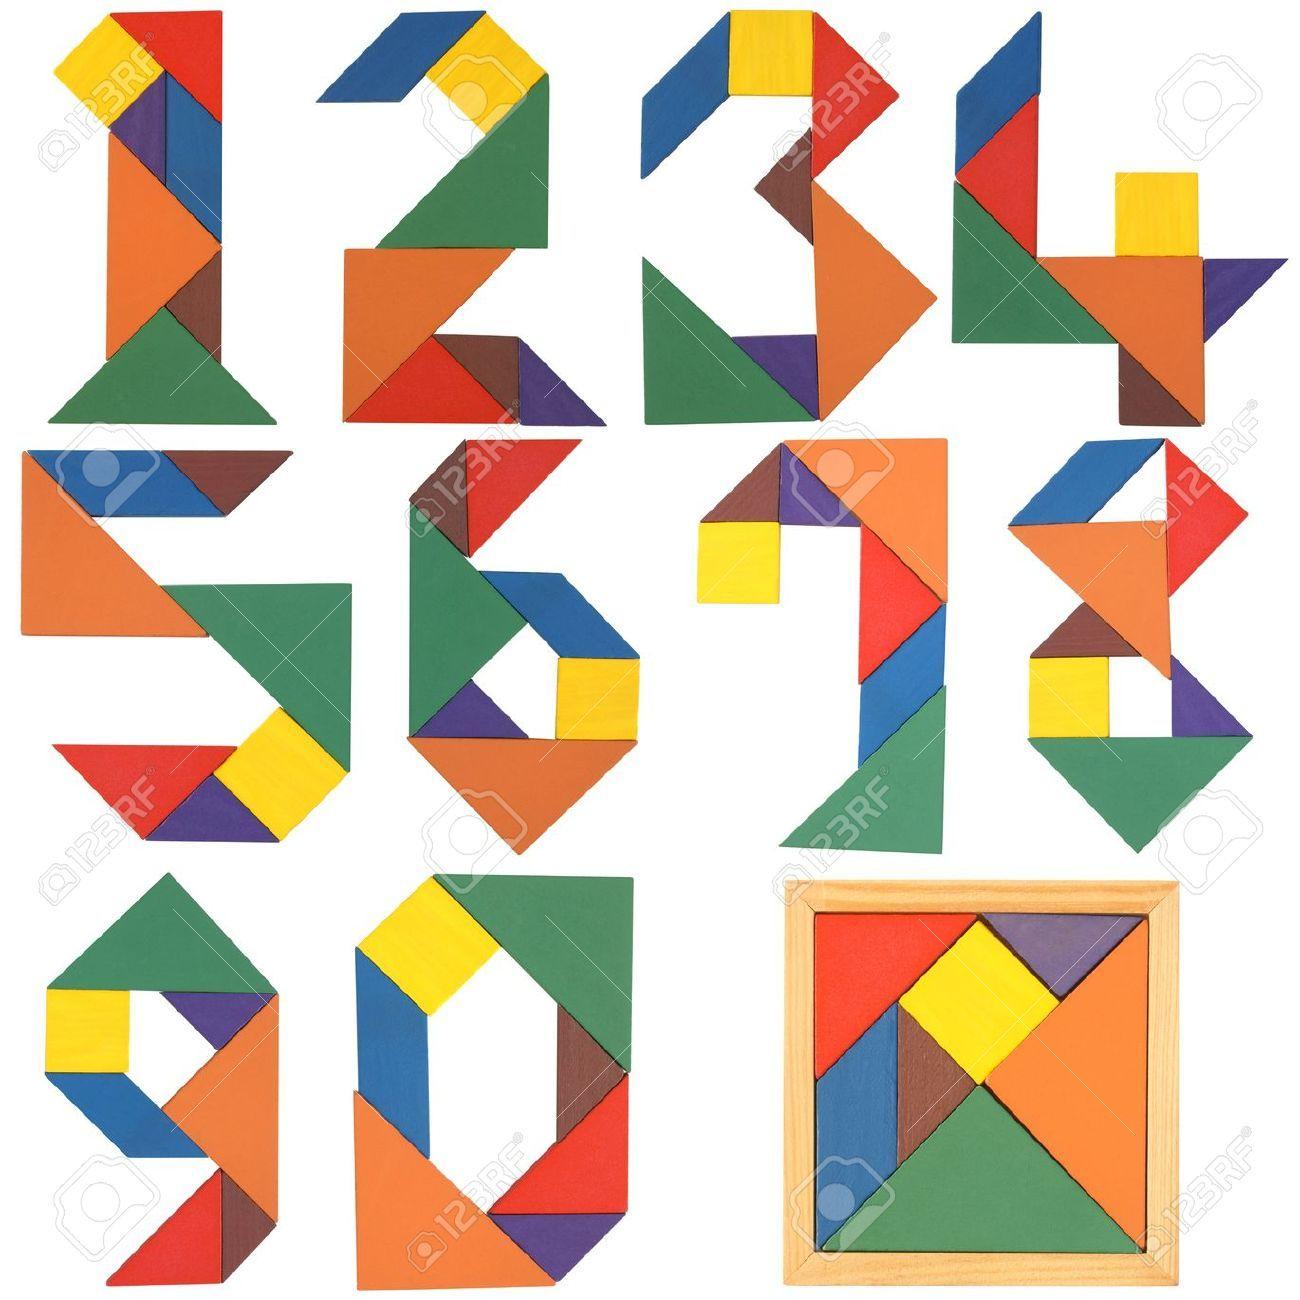 Stock Photo | Figuras Con Tangram, Tangram, Tangrama über Tangram Vorlagen